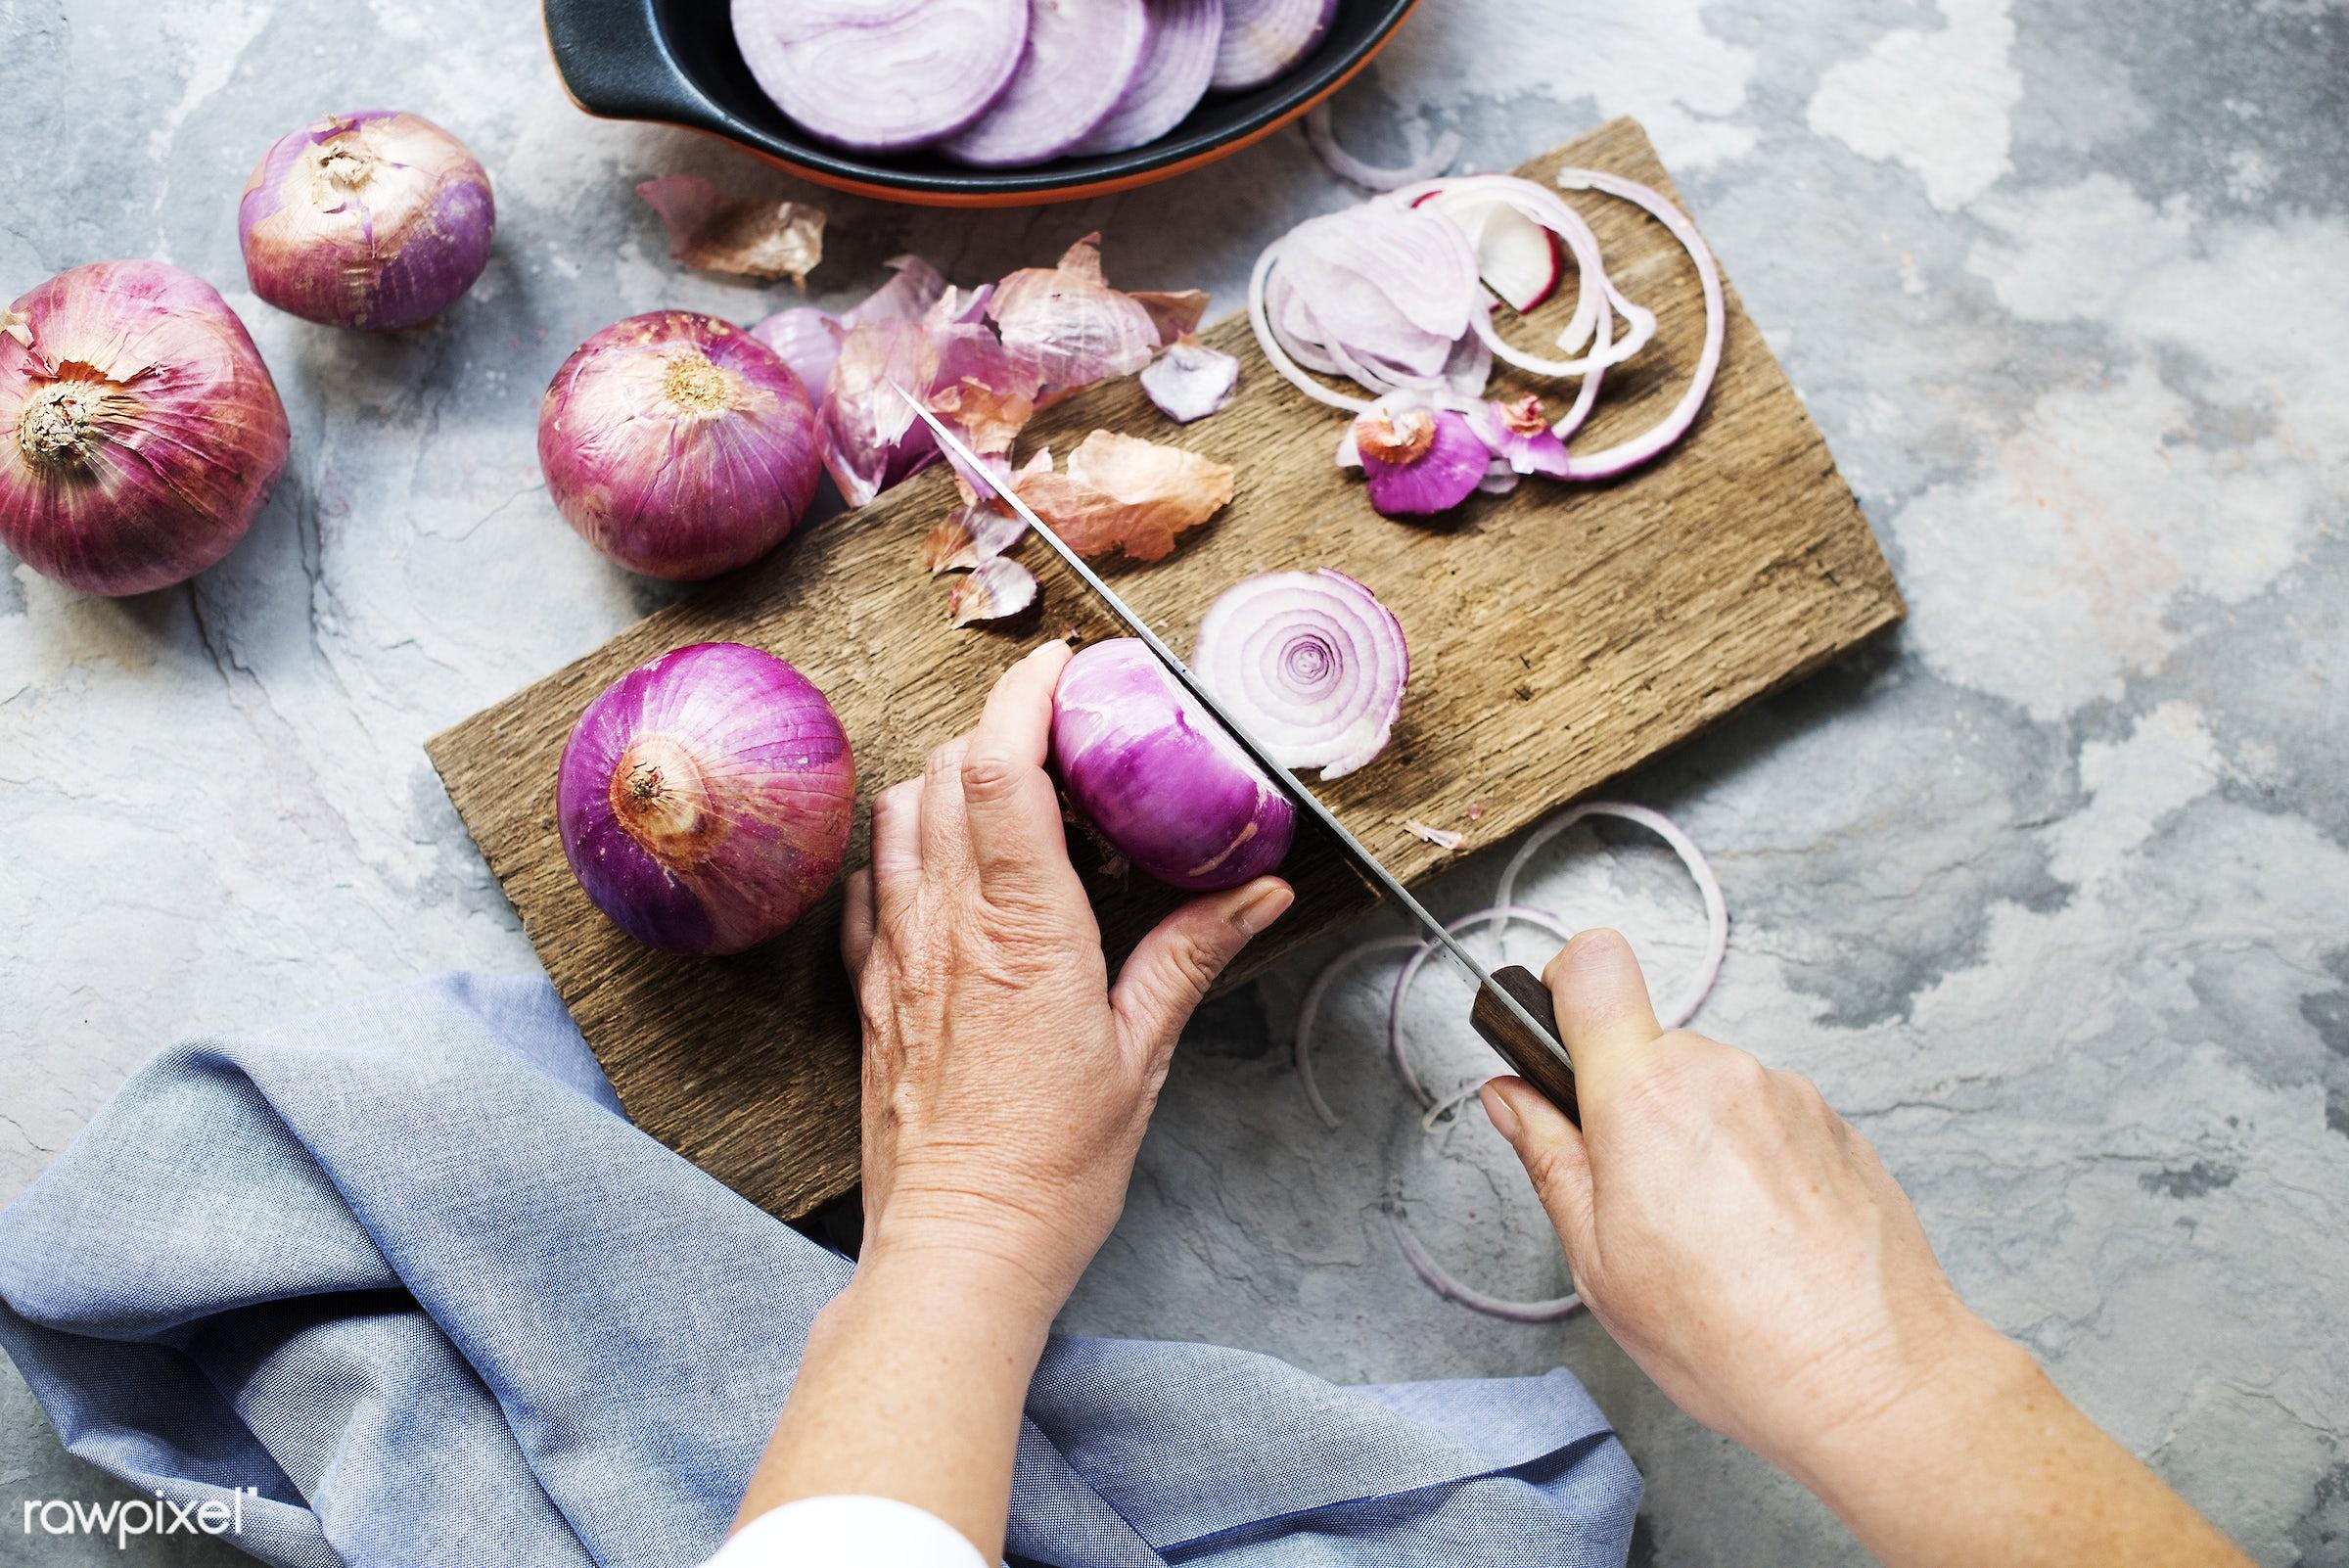 chopping board, chop board, nature, fresh, hands, aerial view, onion, closeup, knife, cut board, preparation, cutting, red...